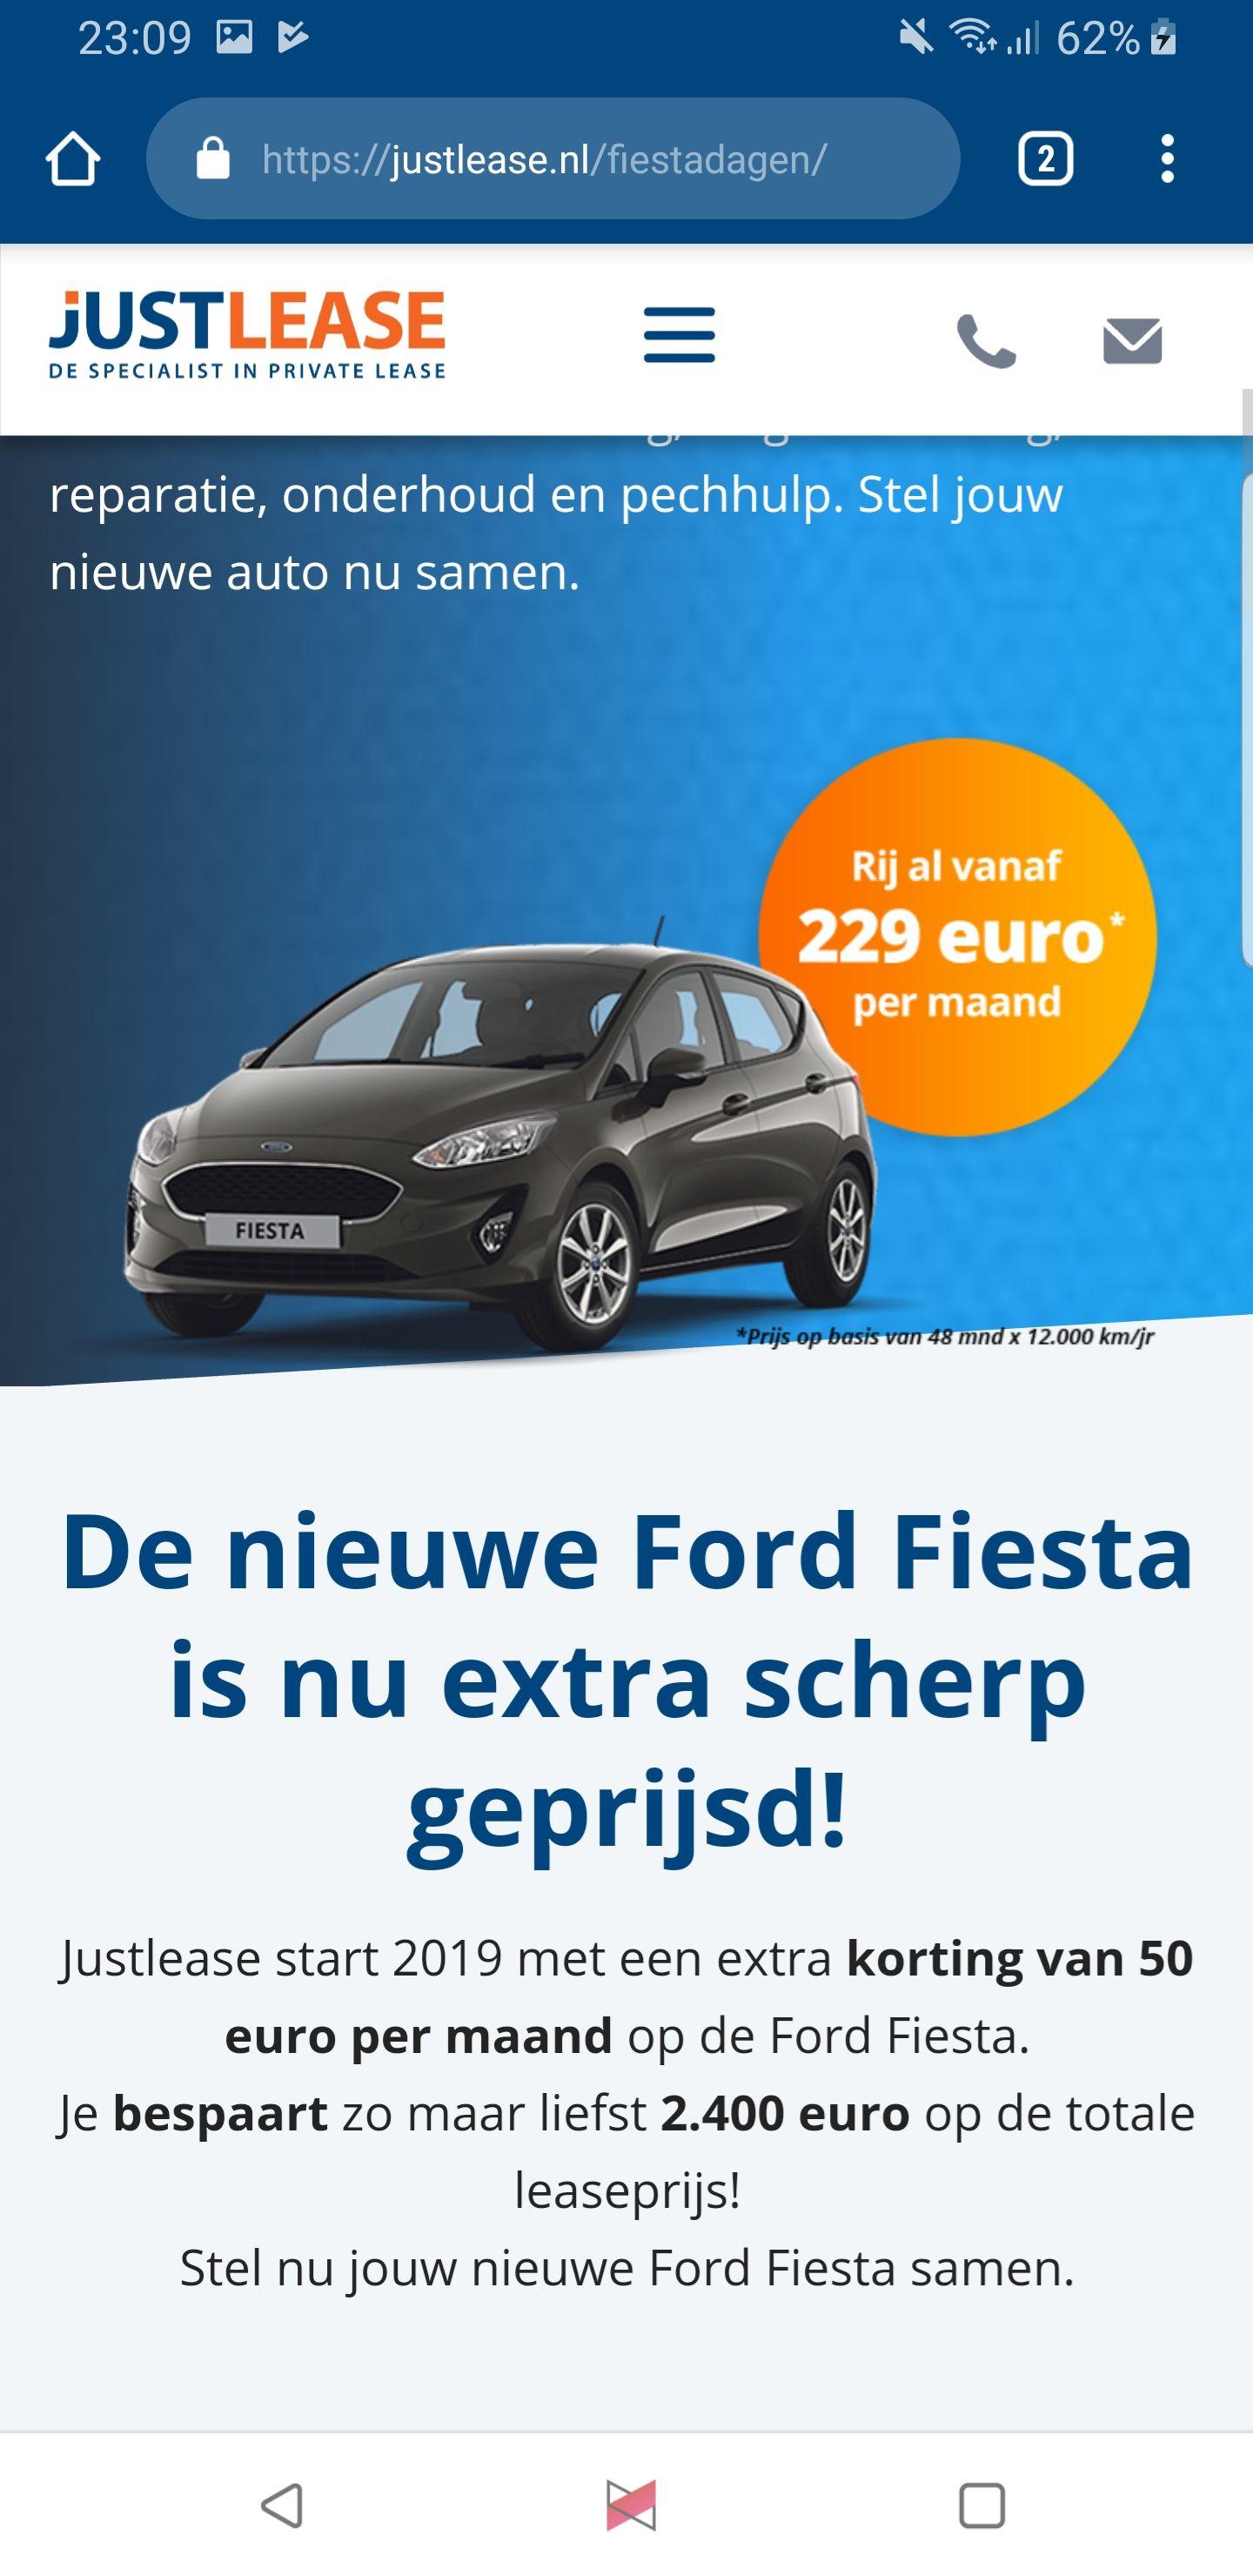 50 euro korting per maand op alle ford fiesta private lease modellen